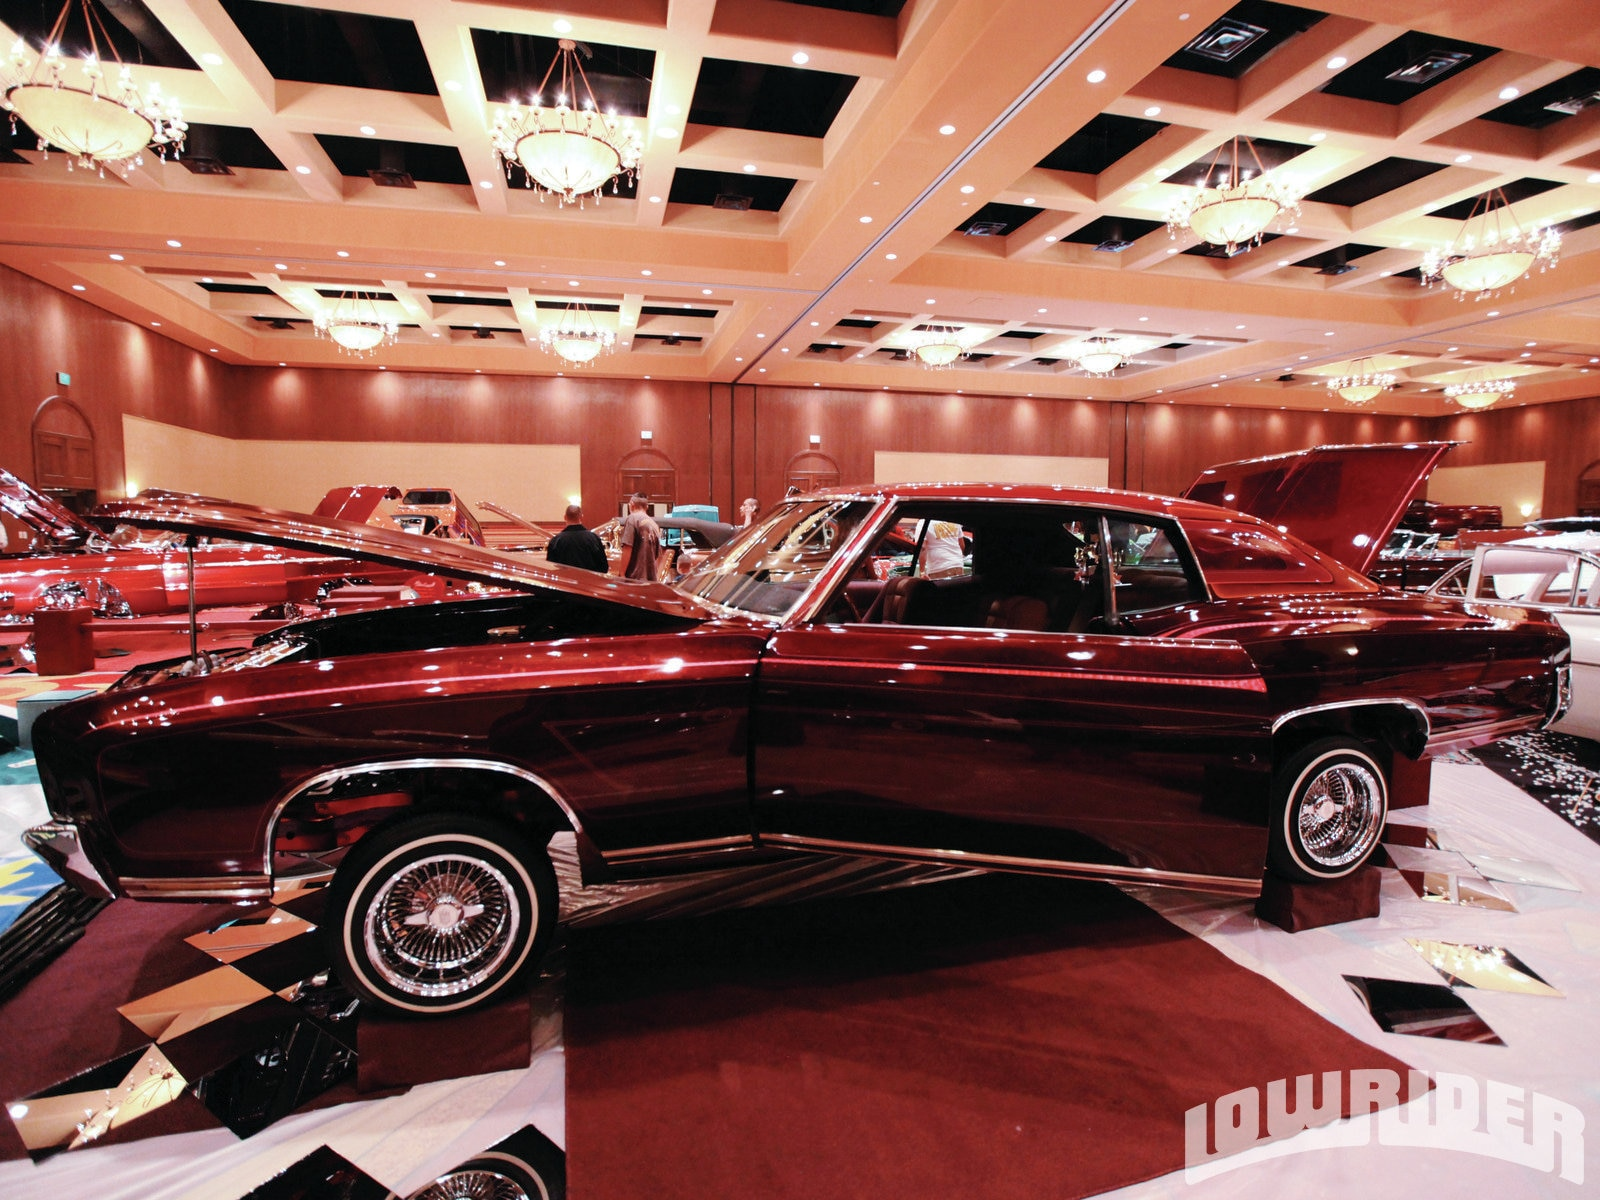 Buffalothundercasinocarshowlowrider Lowrider - Buffalo car show